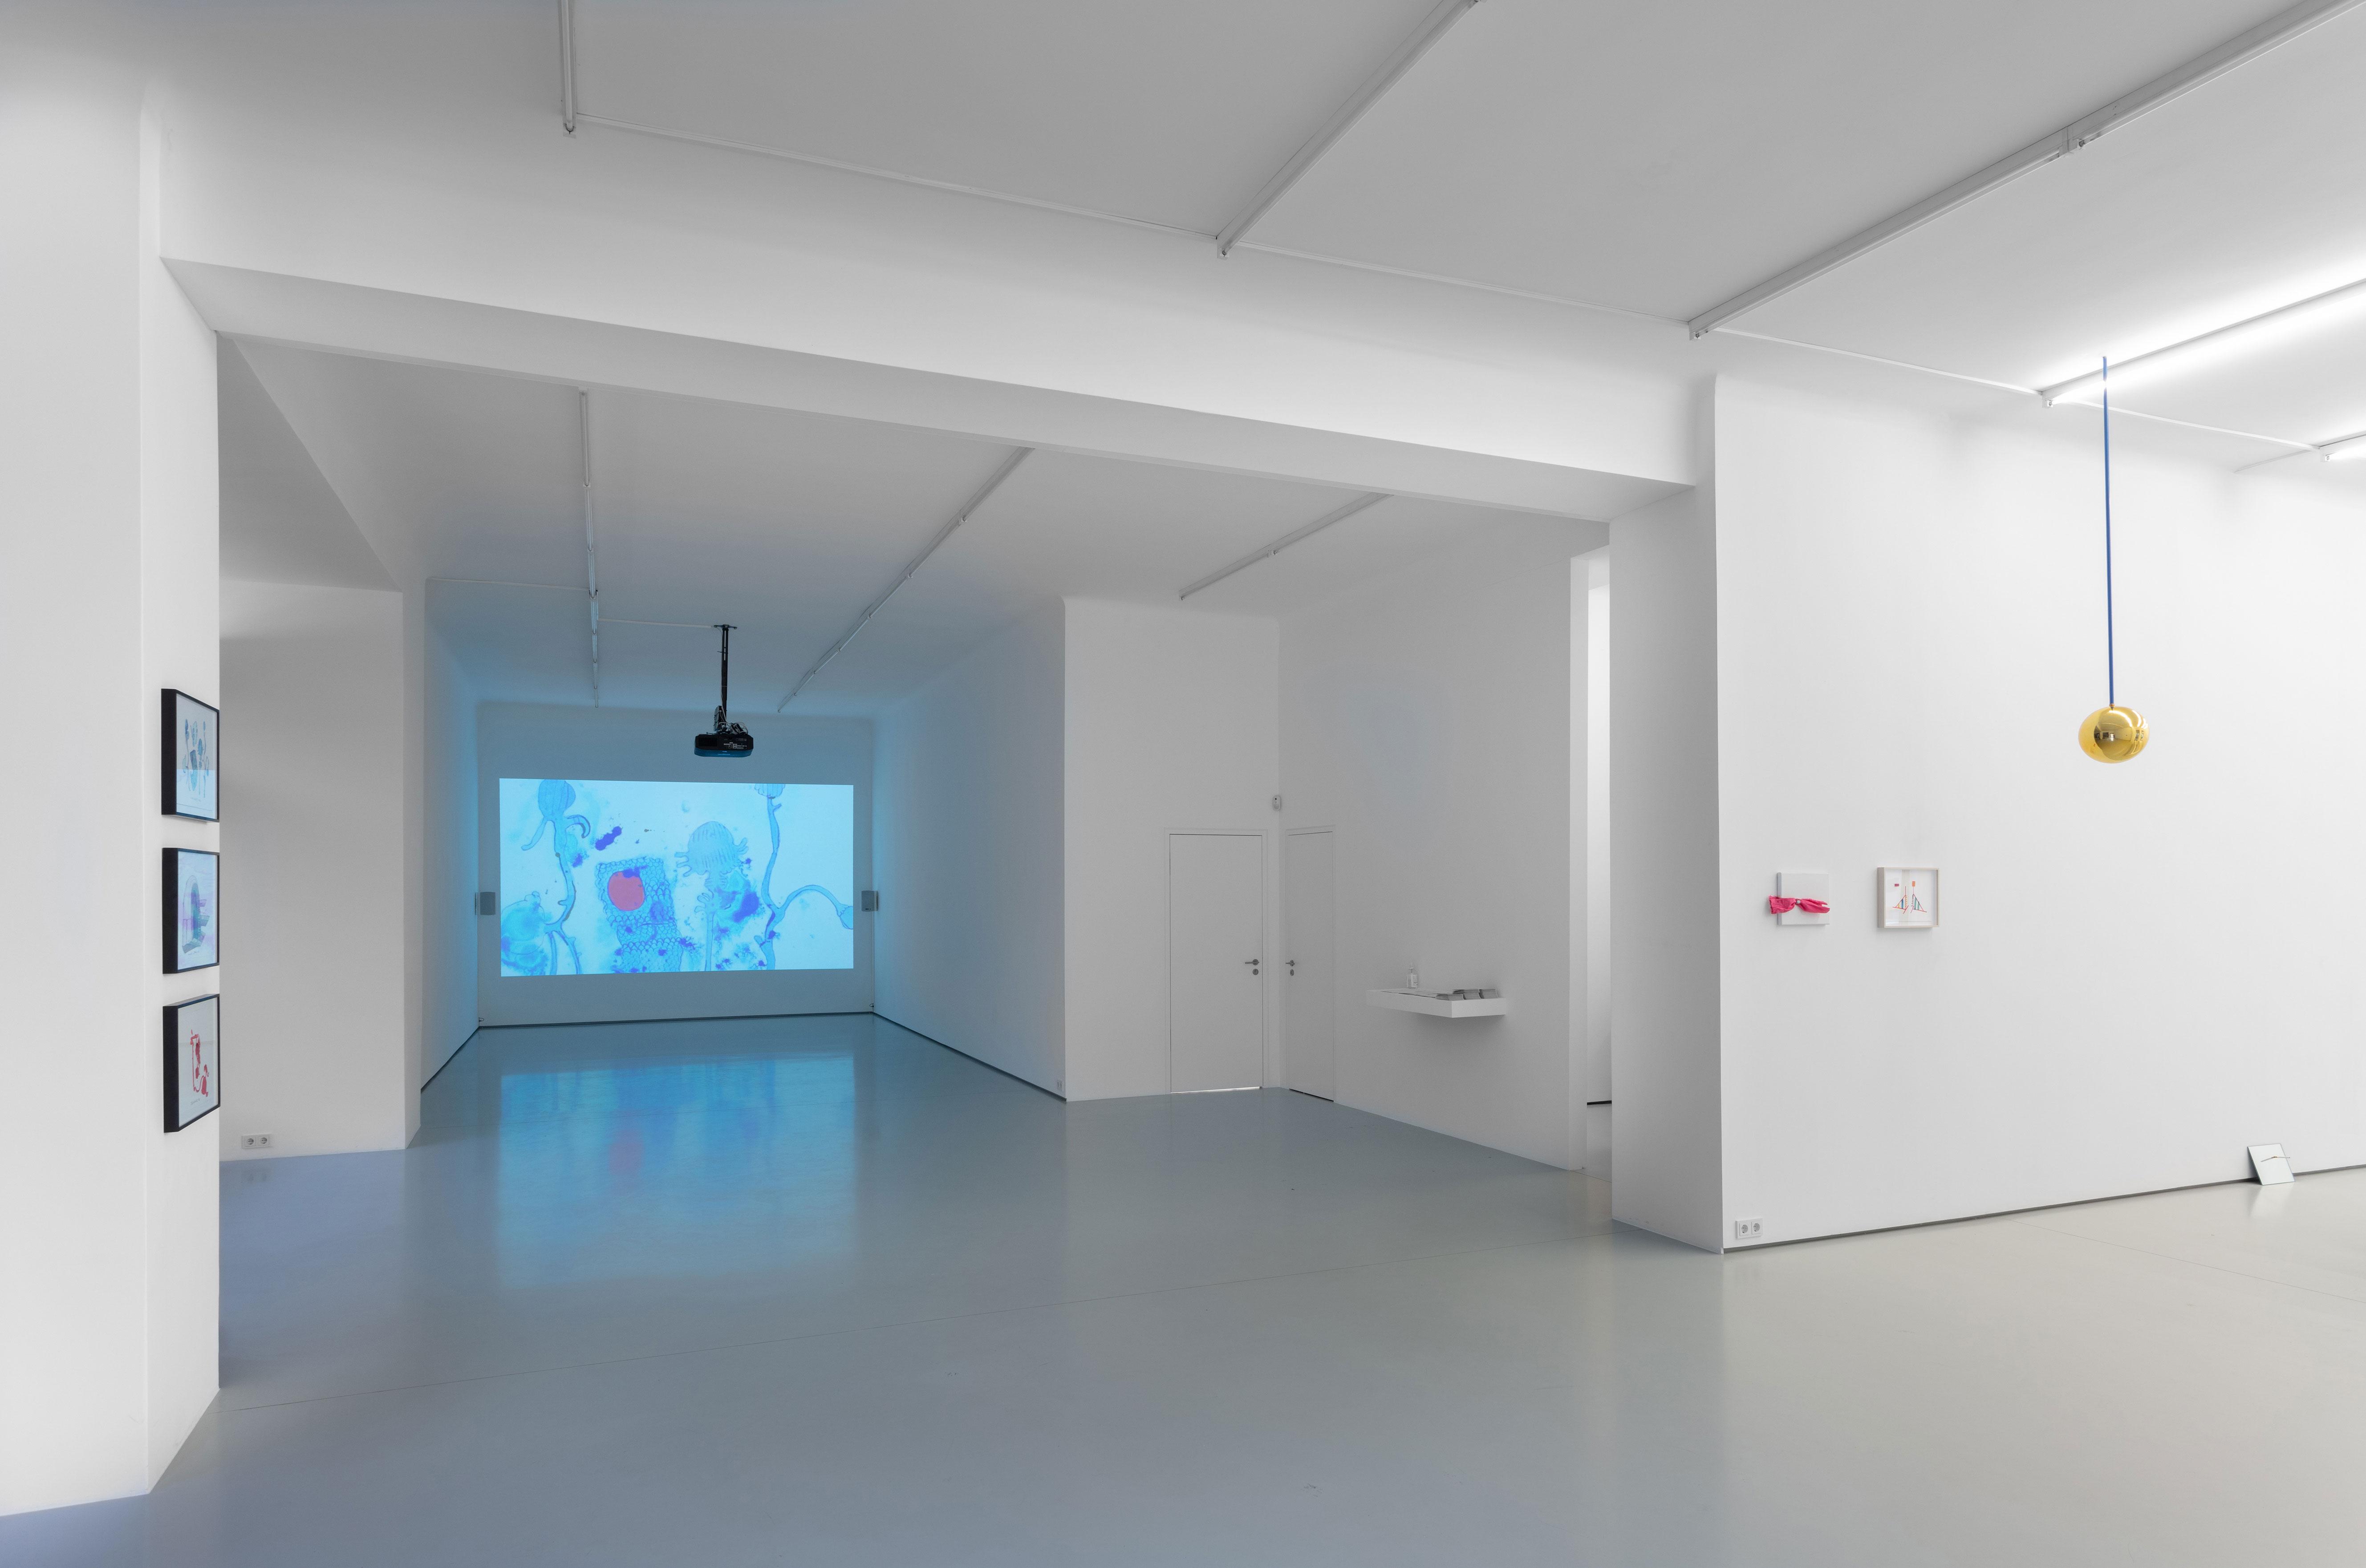 Christine Rebet, Shadows of Family Tree, exhibition view at Gregor Podnar, Berlin, 2020. Photo: Marjorie Brunet Plaza